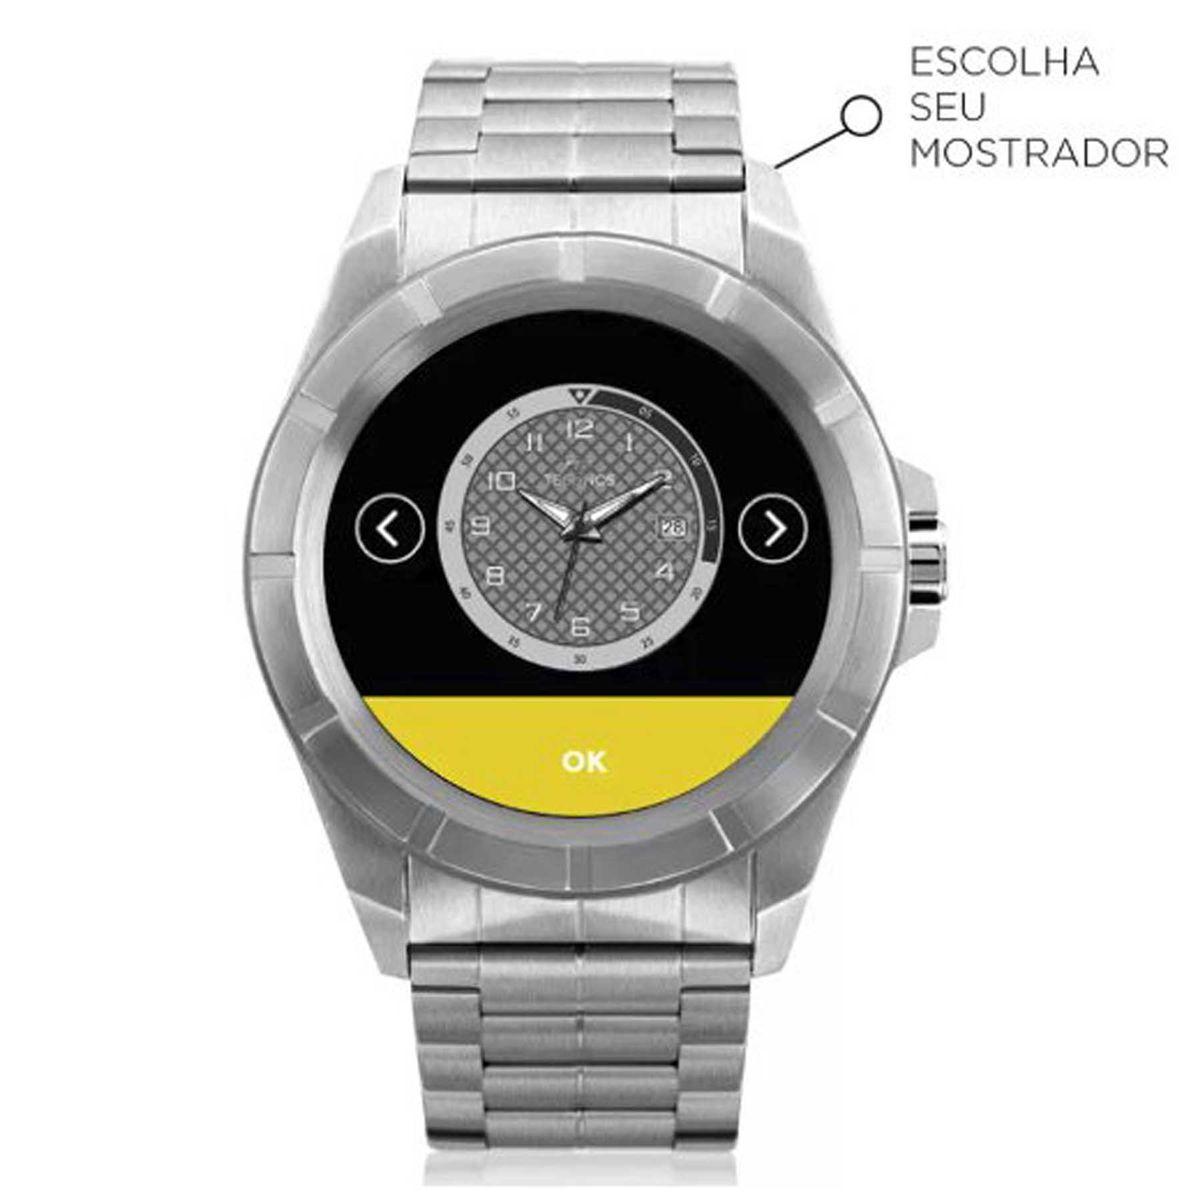 dfea64de3f7aa Relógio Technos Connect Smartwatch Bluetooth SRAA 1P R  1.199,00 à vista.  Adicionar à sacola